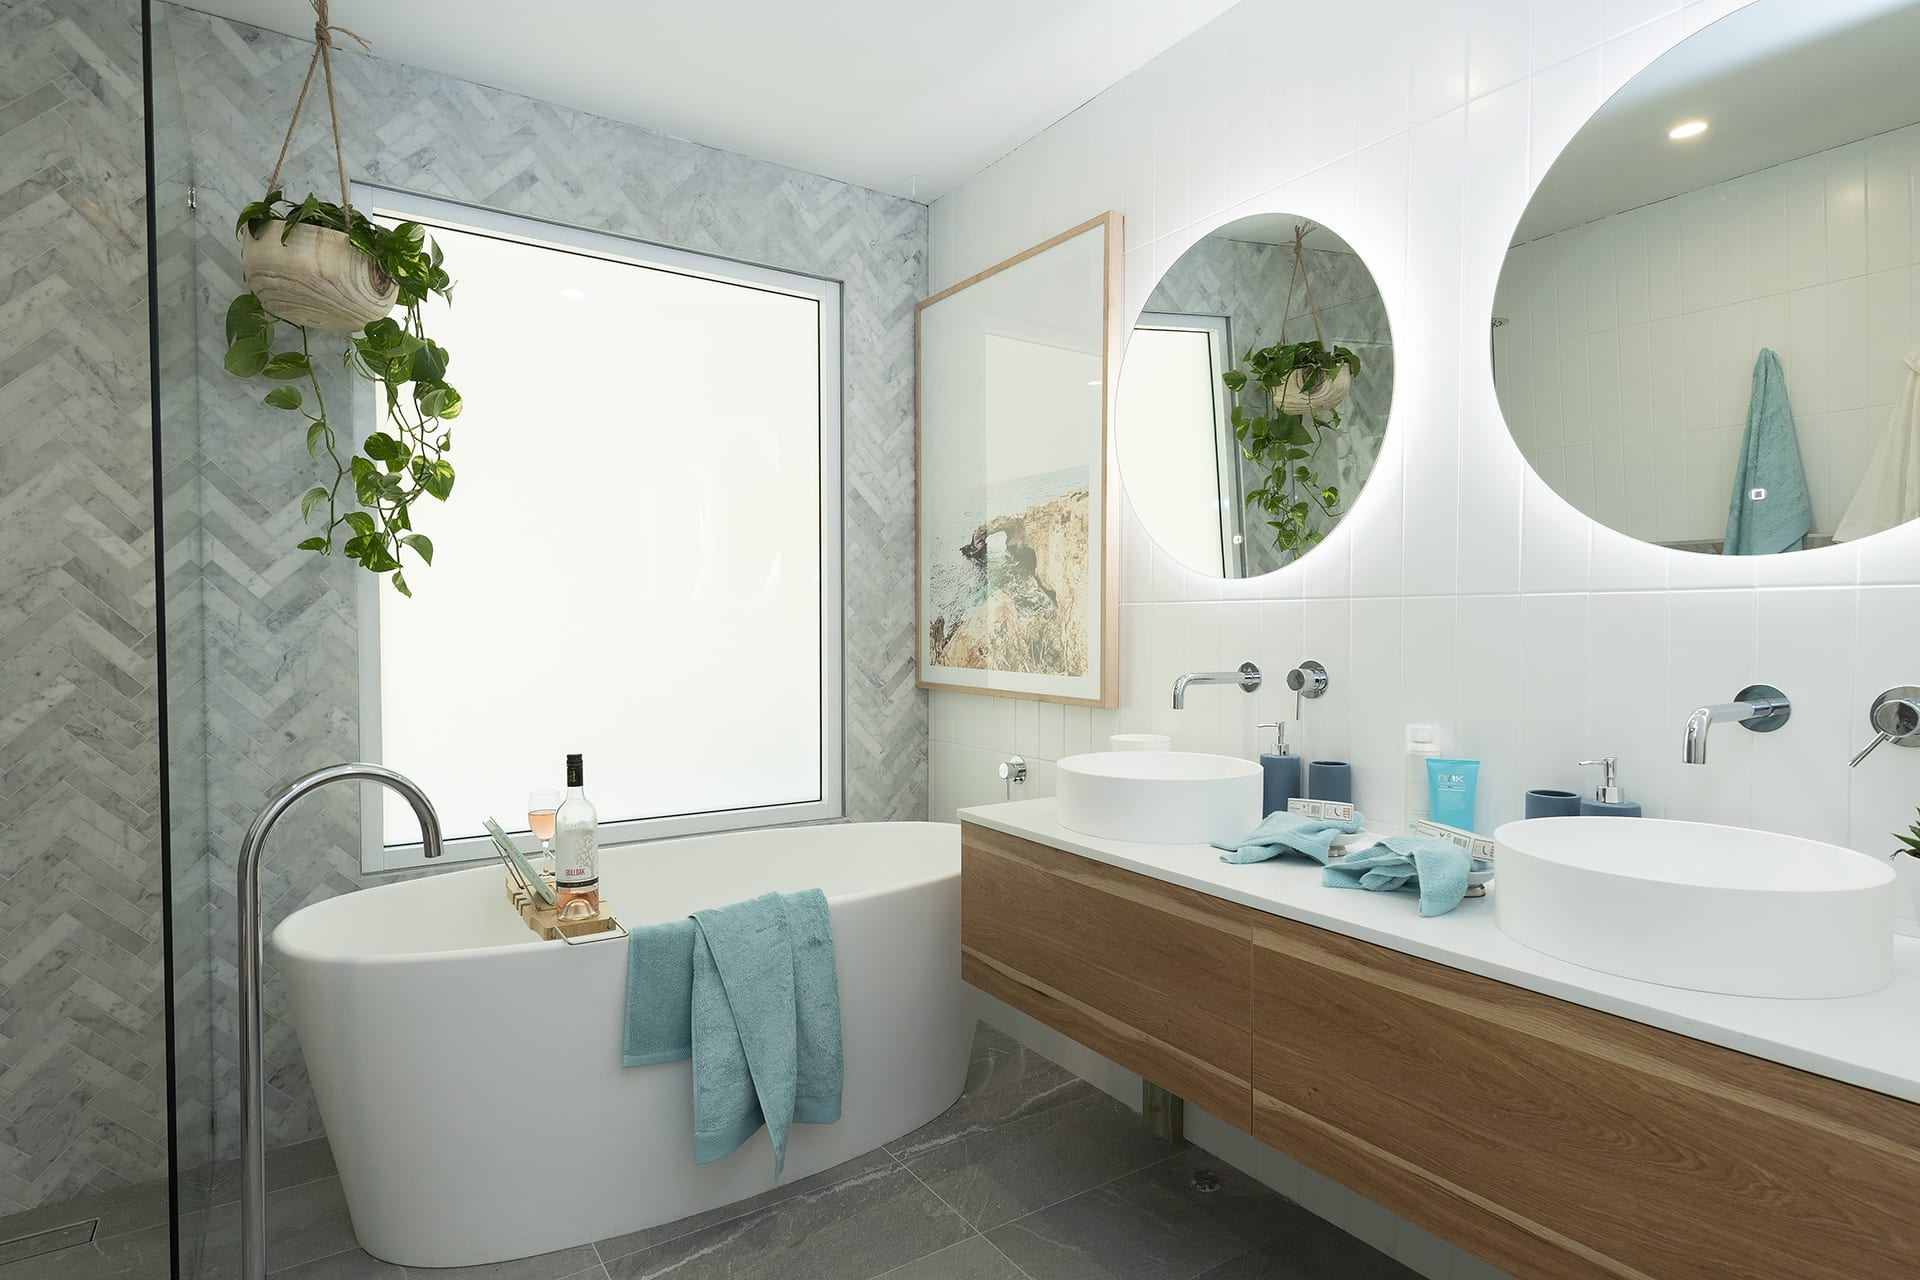 house rules 2019 eliza and mikaela bathroom with marble herringbone tiles